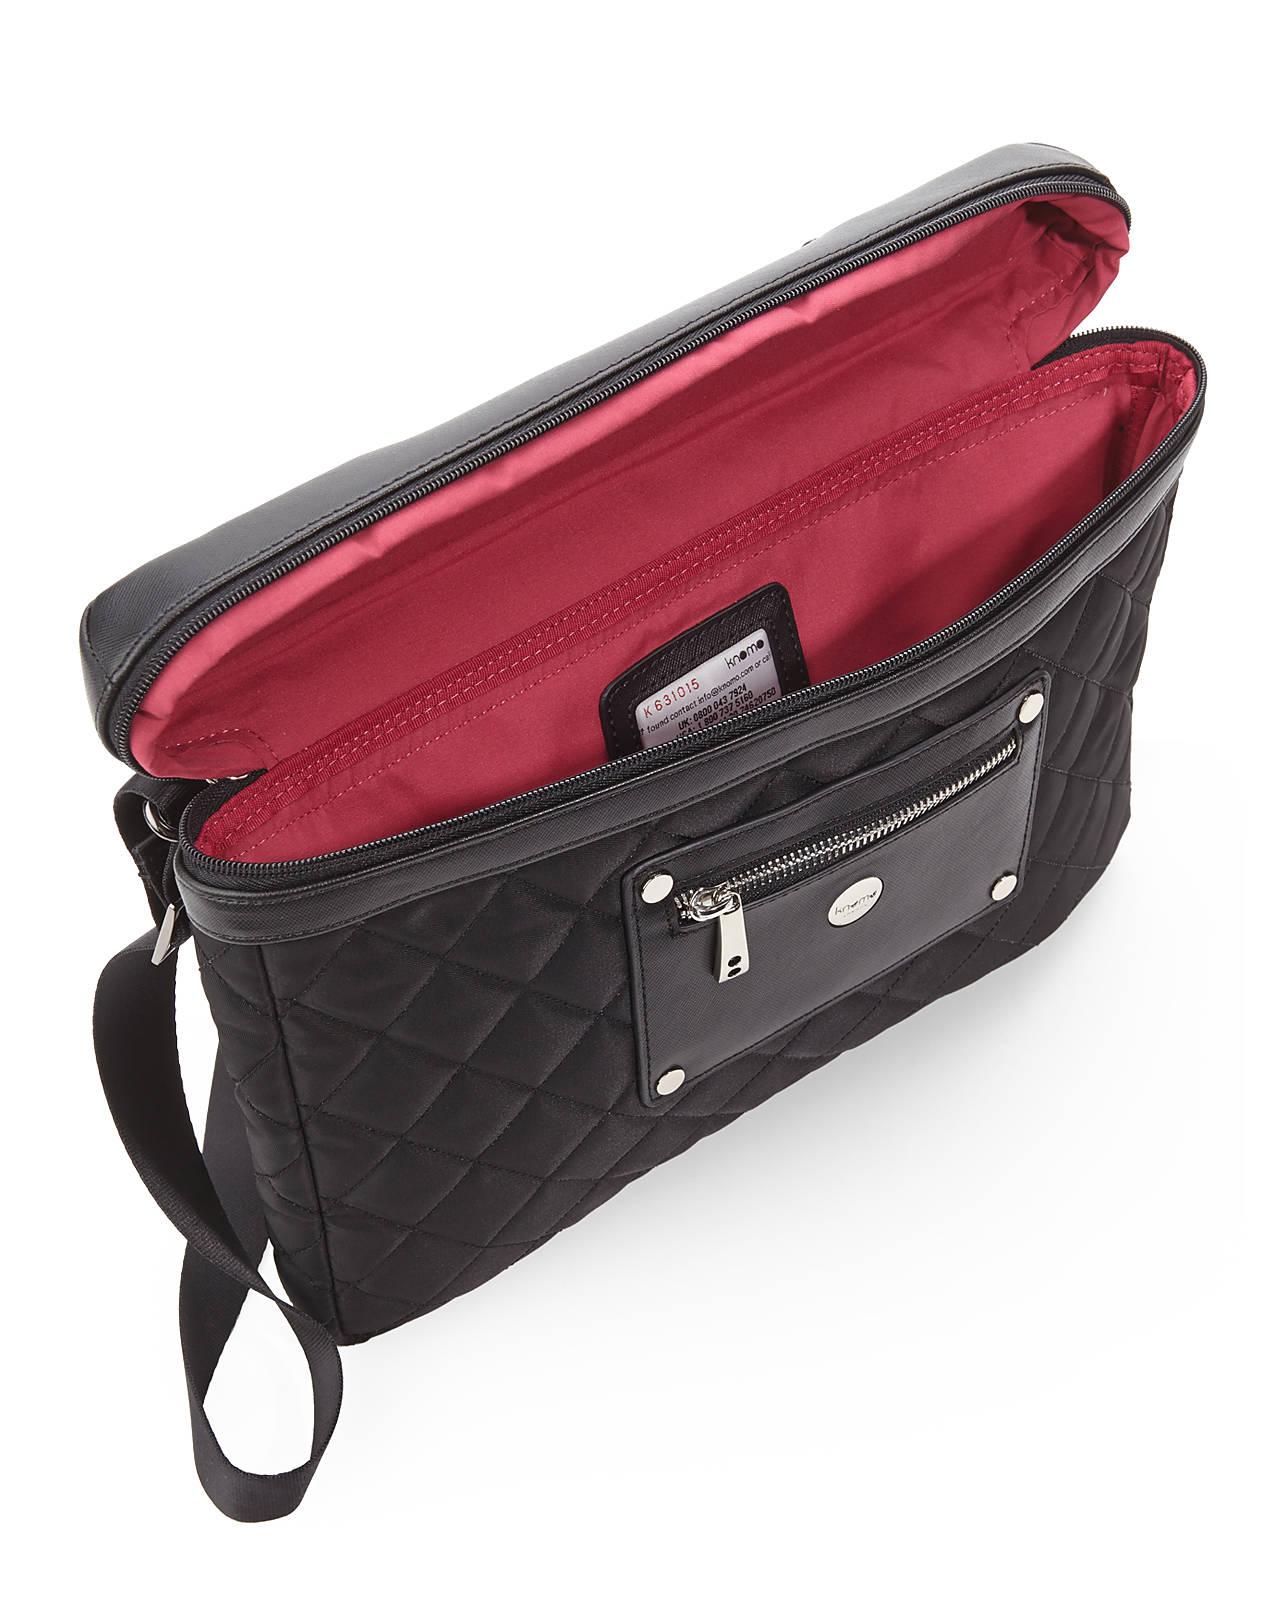 Lyst - Knomo Black Small Slim Sleeve Laptop Case in Black for Men c3b2a48bb6dd